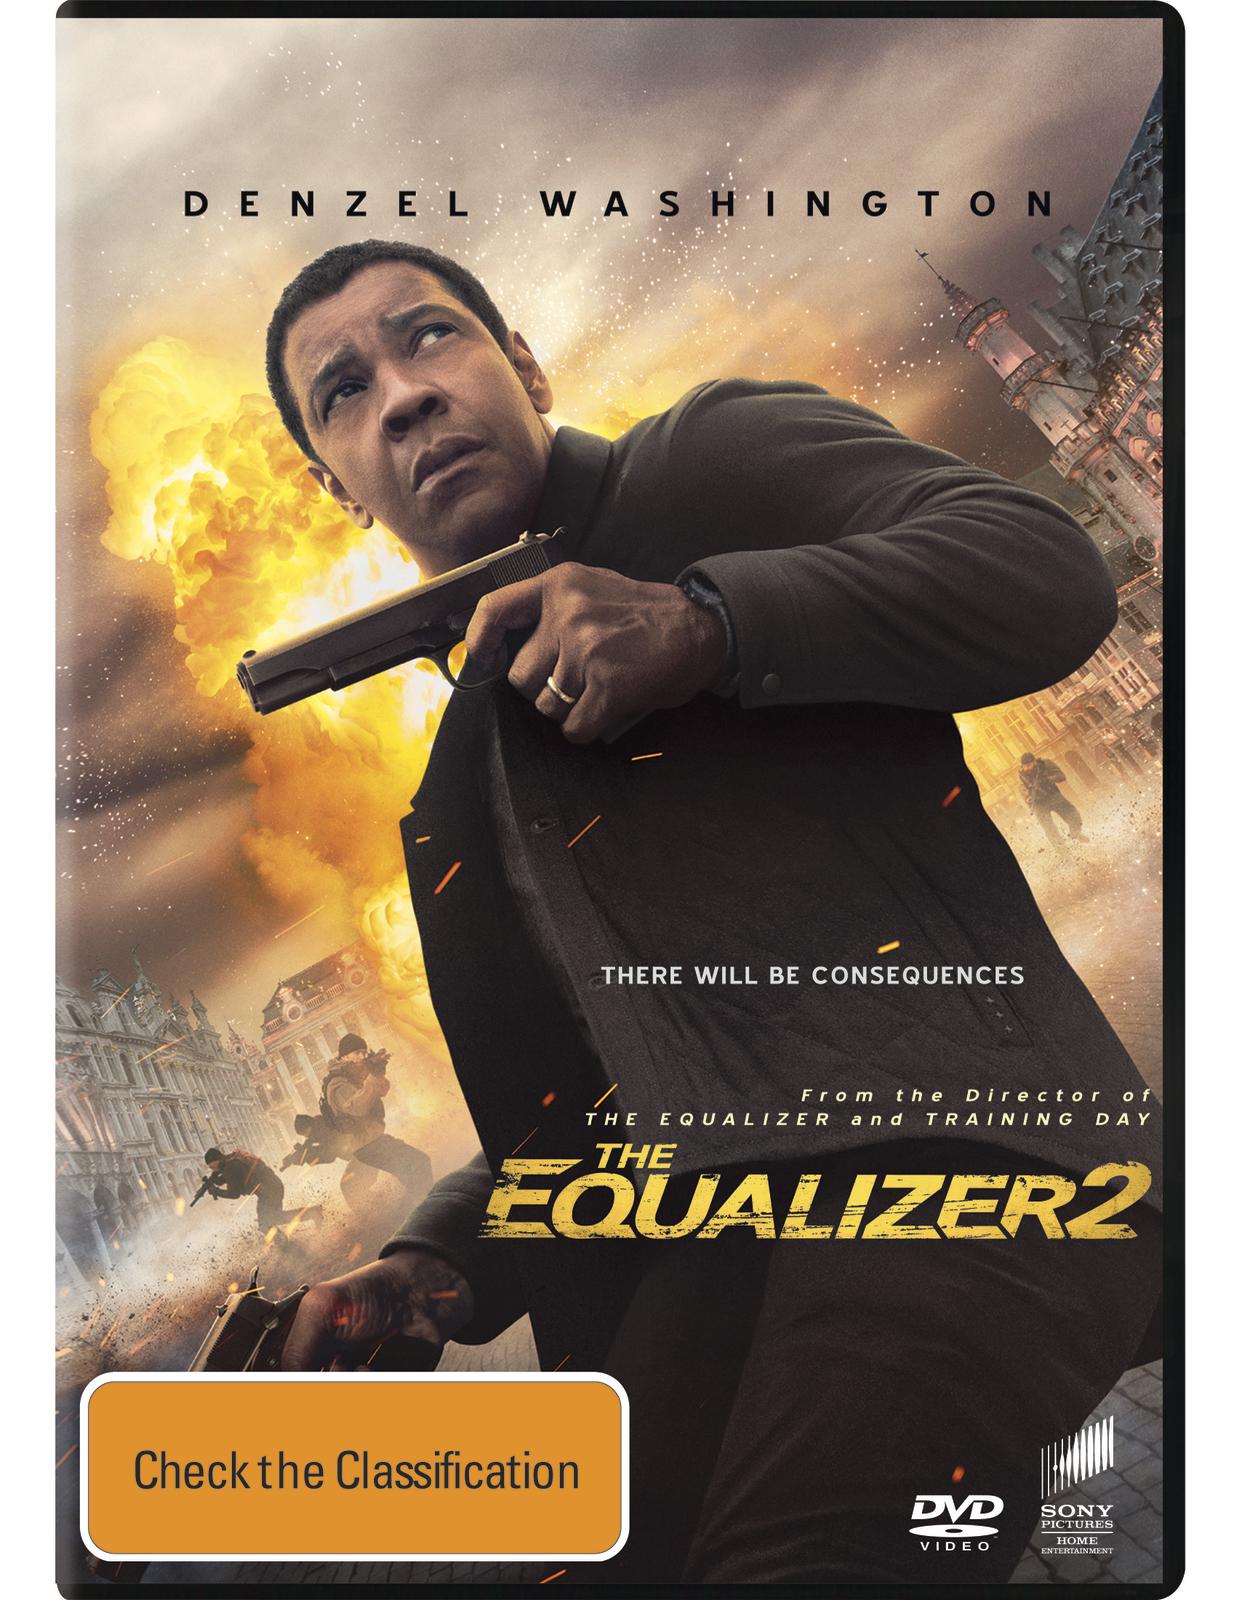 The Equalizer 2 on DVD image